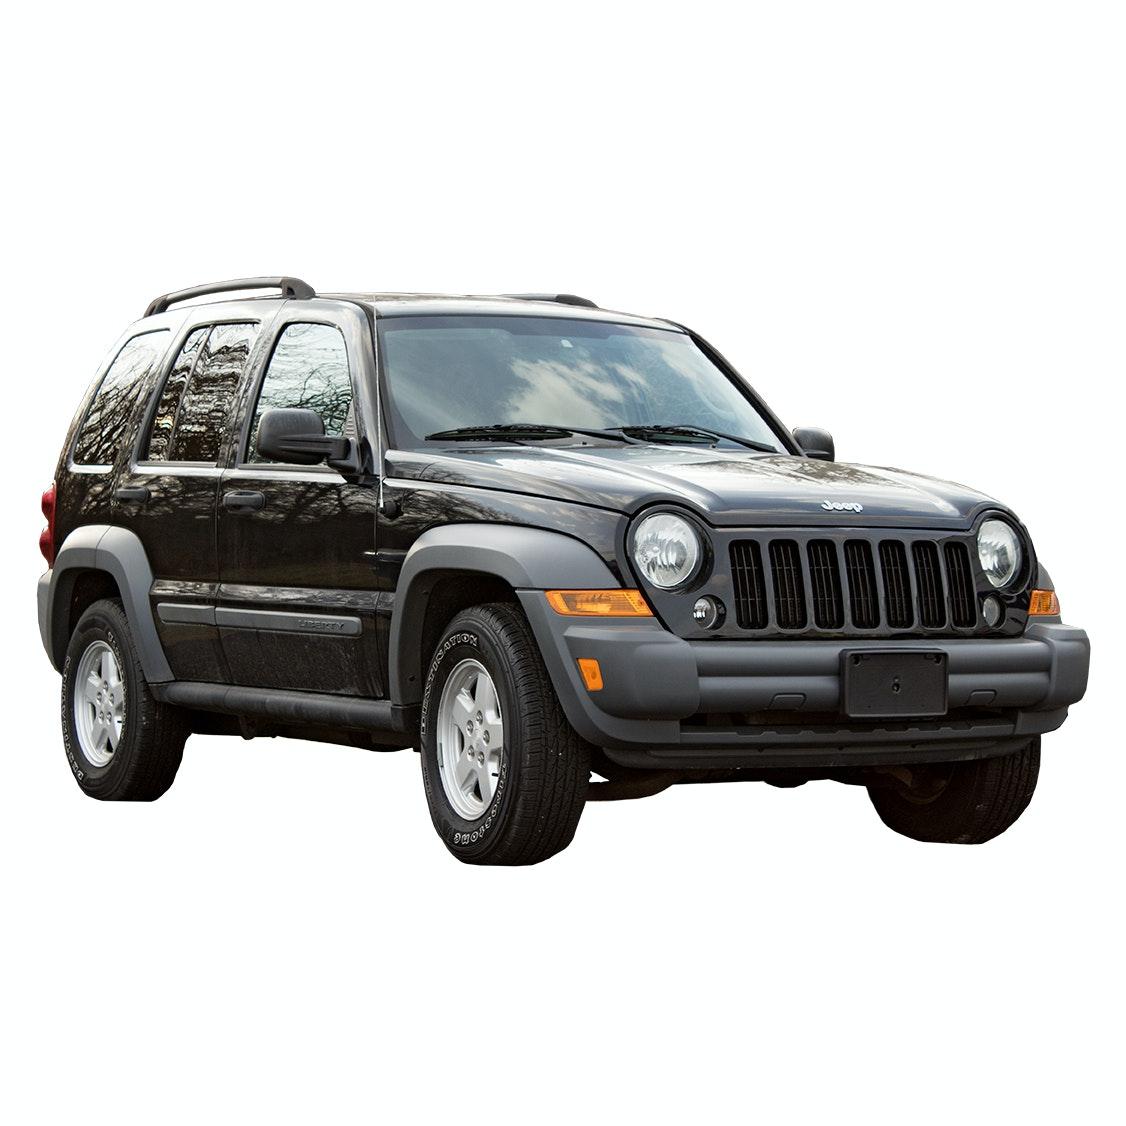 2005 Jeep Liberty 4x4